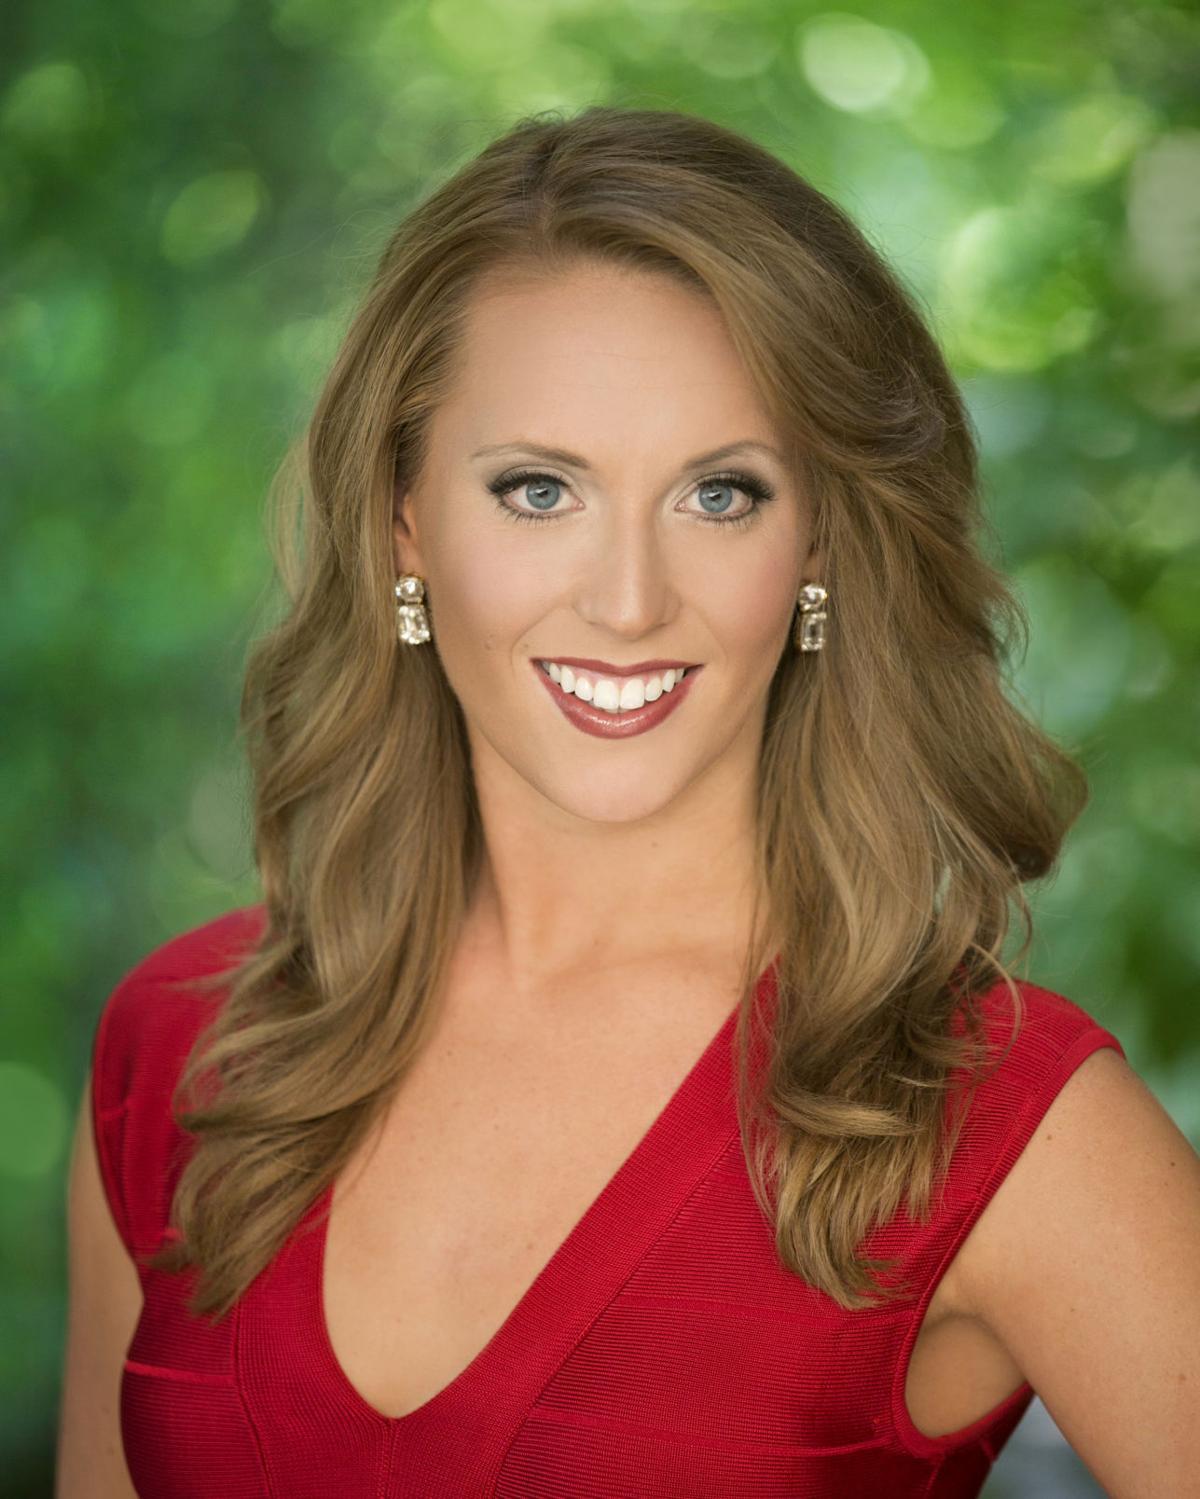 Miss Colorado 2017 Meredith Winnefeld